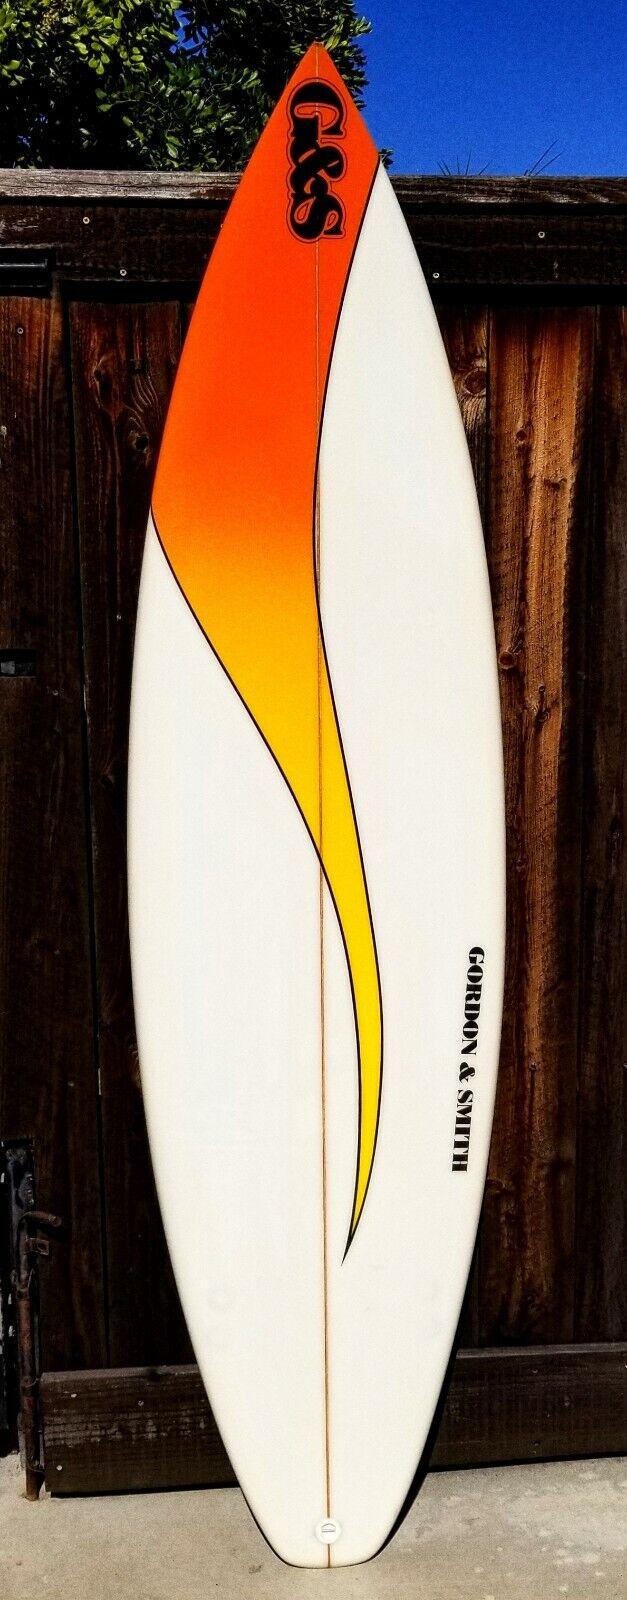 6' 6  G&S Gordon & Smith Onda anhelan Modelo Tabla de Surf FCS propulsor de configurar  nuevo